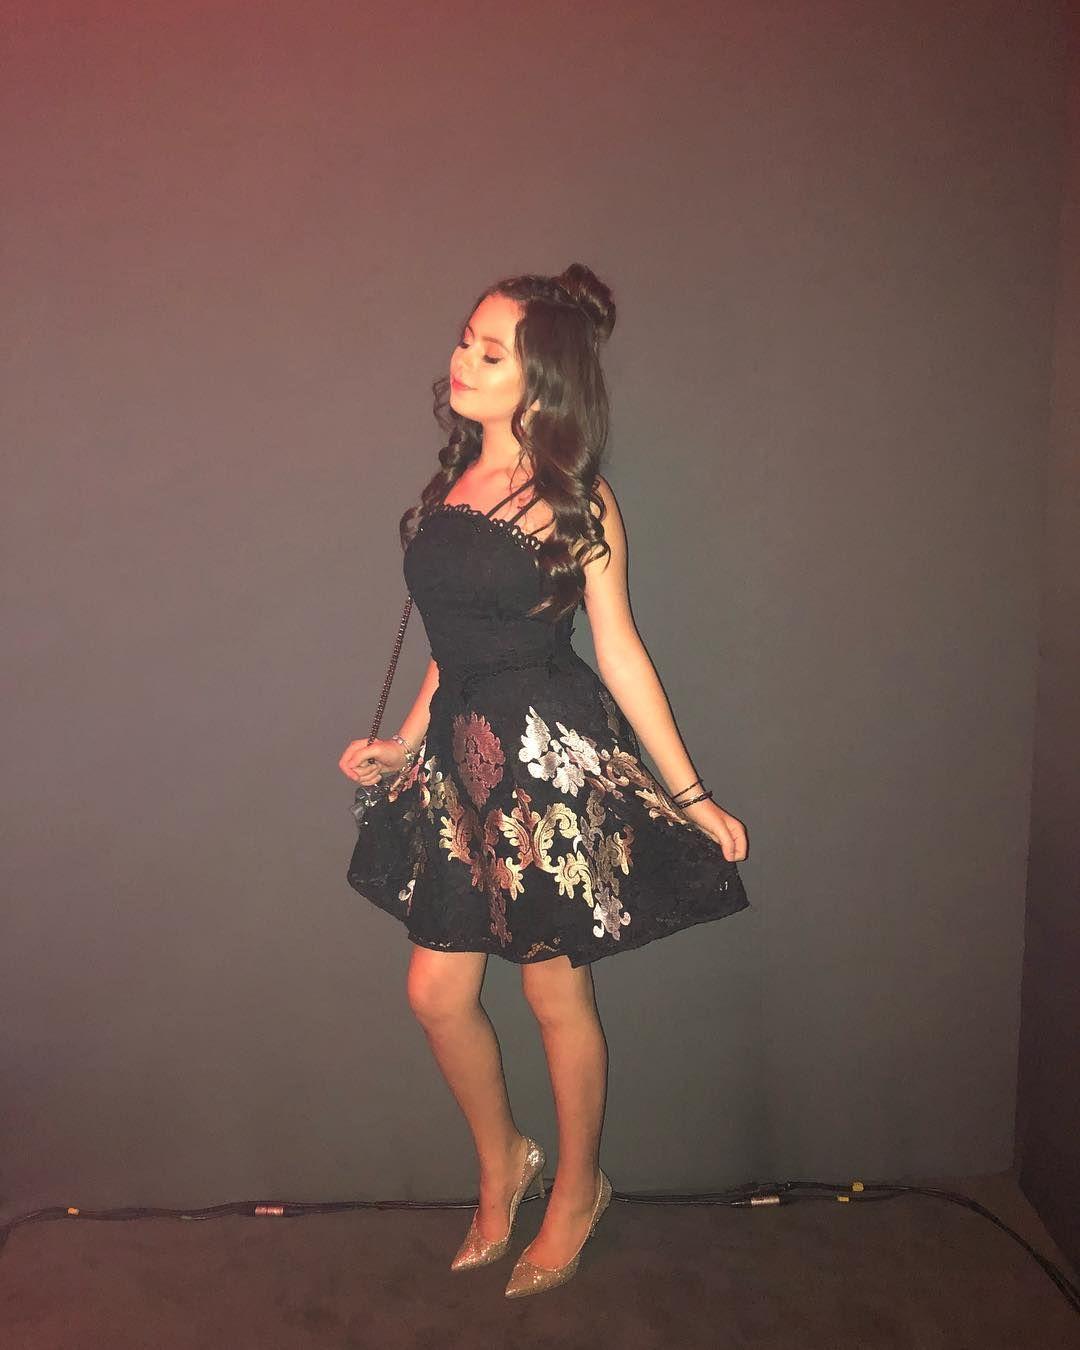 Pin de Larissa Manoela OFICIAL!! ✓ em Celebrities em 2019   Pinterest    Celebrities ee71df29a4